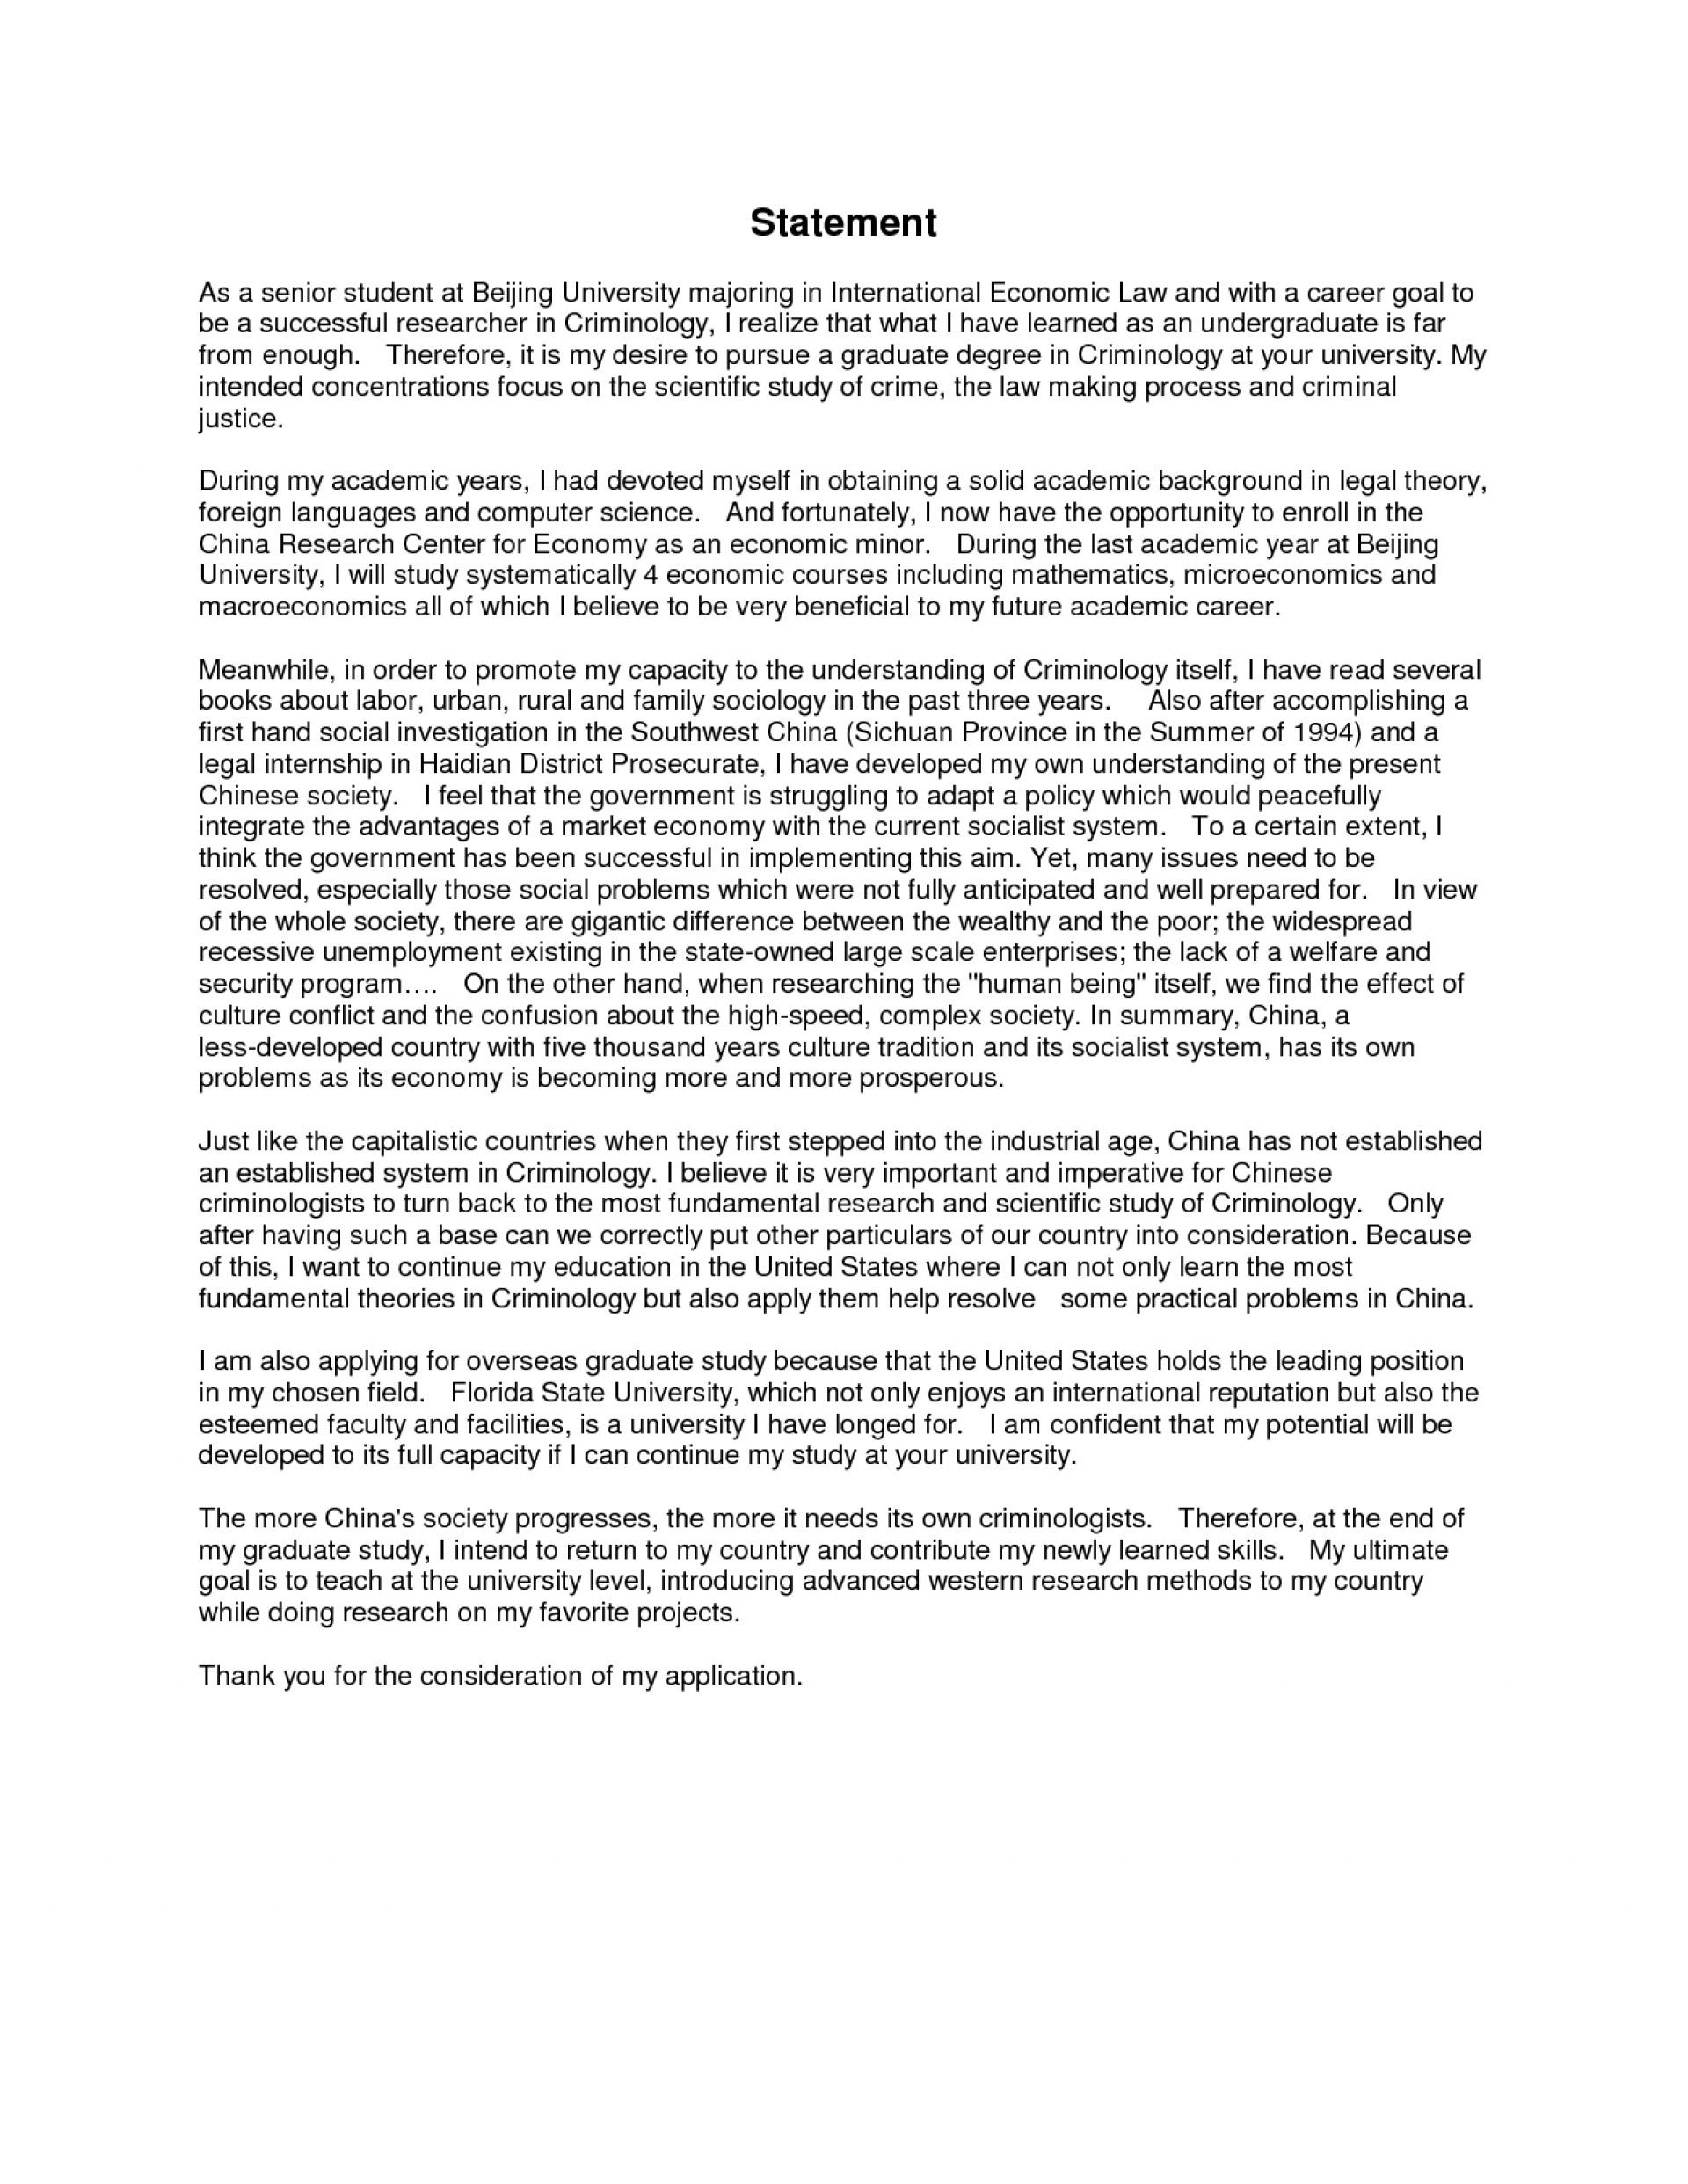 012 2444263891 What Is An Academic Essay Pdf Unbelievable Gujarati Free Download Argumentative Terrorism 1920